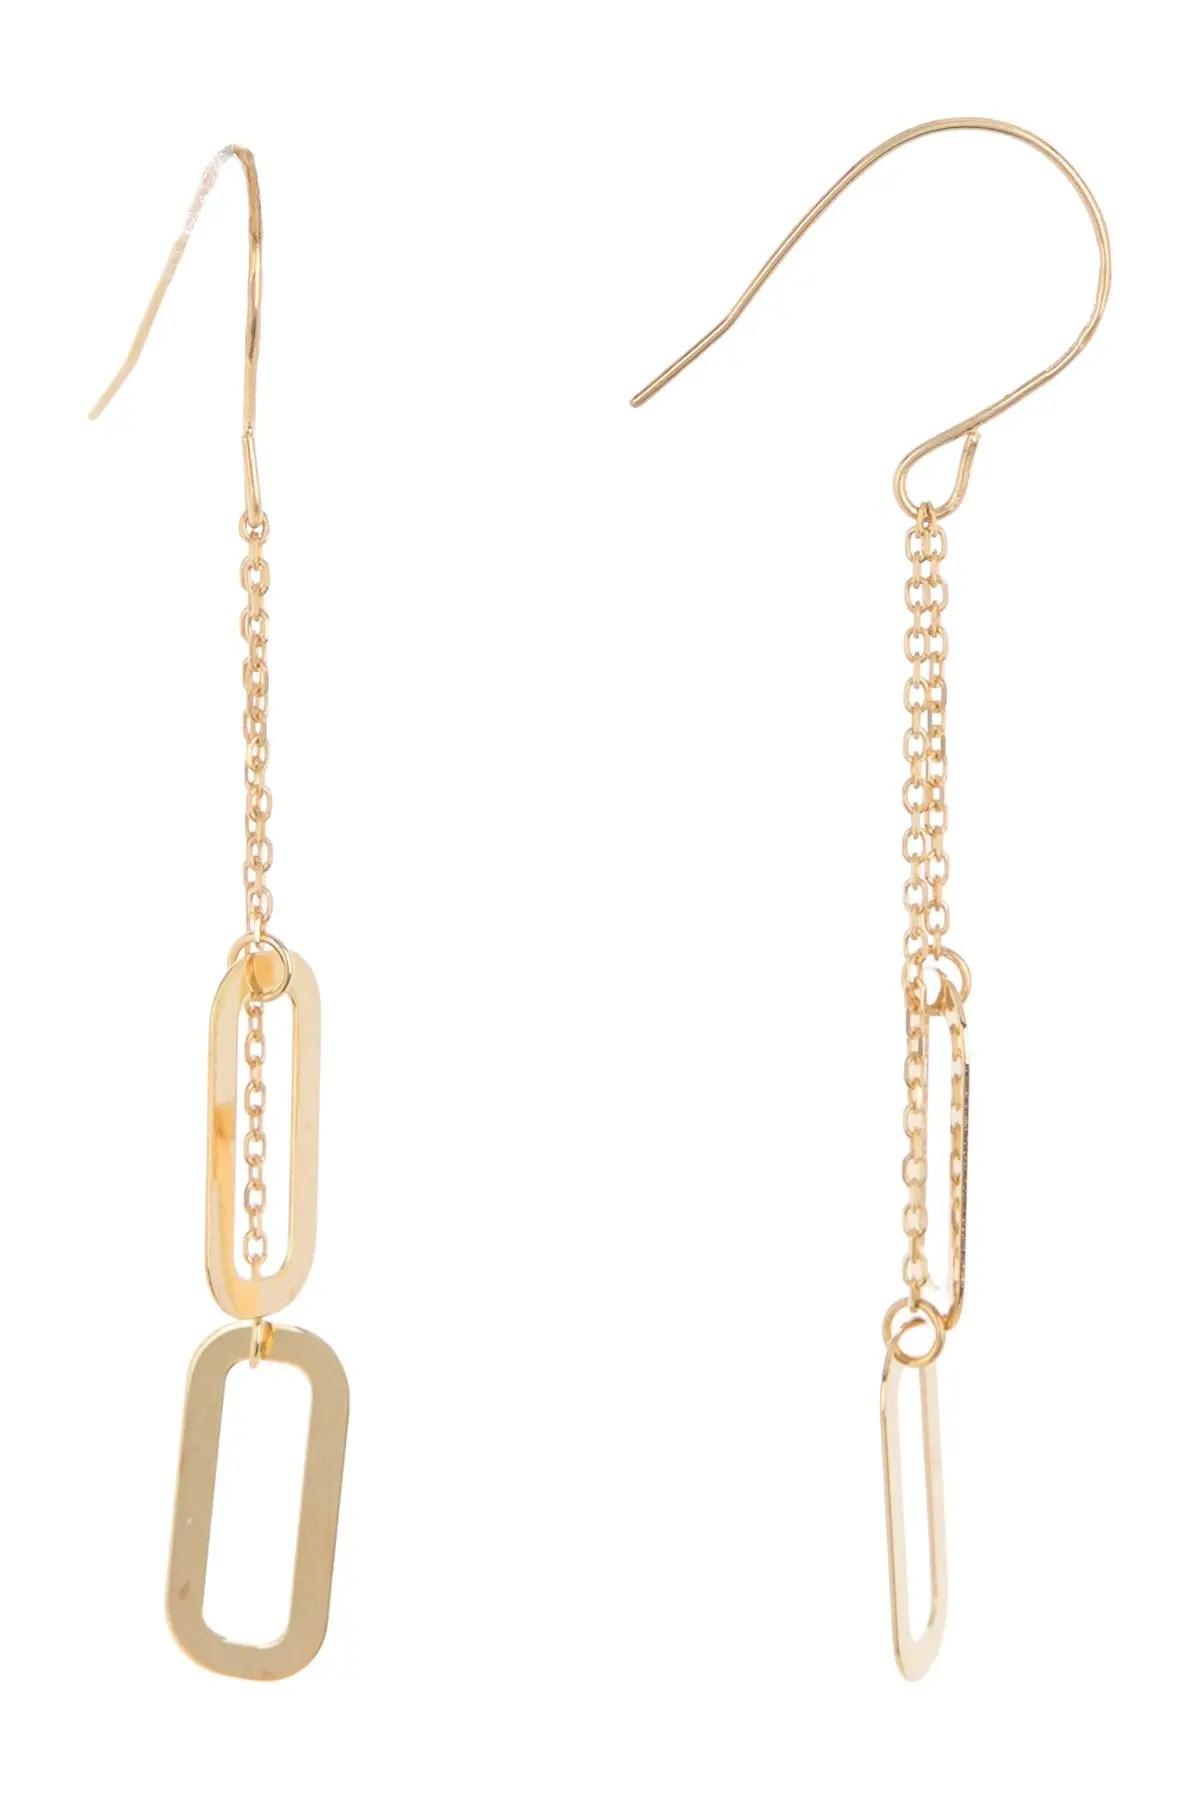 bony levy 14k yellow gold link drop earrings nordstrom rack